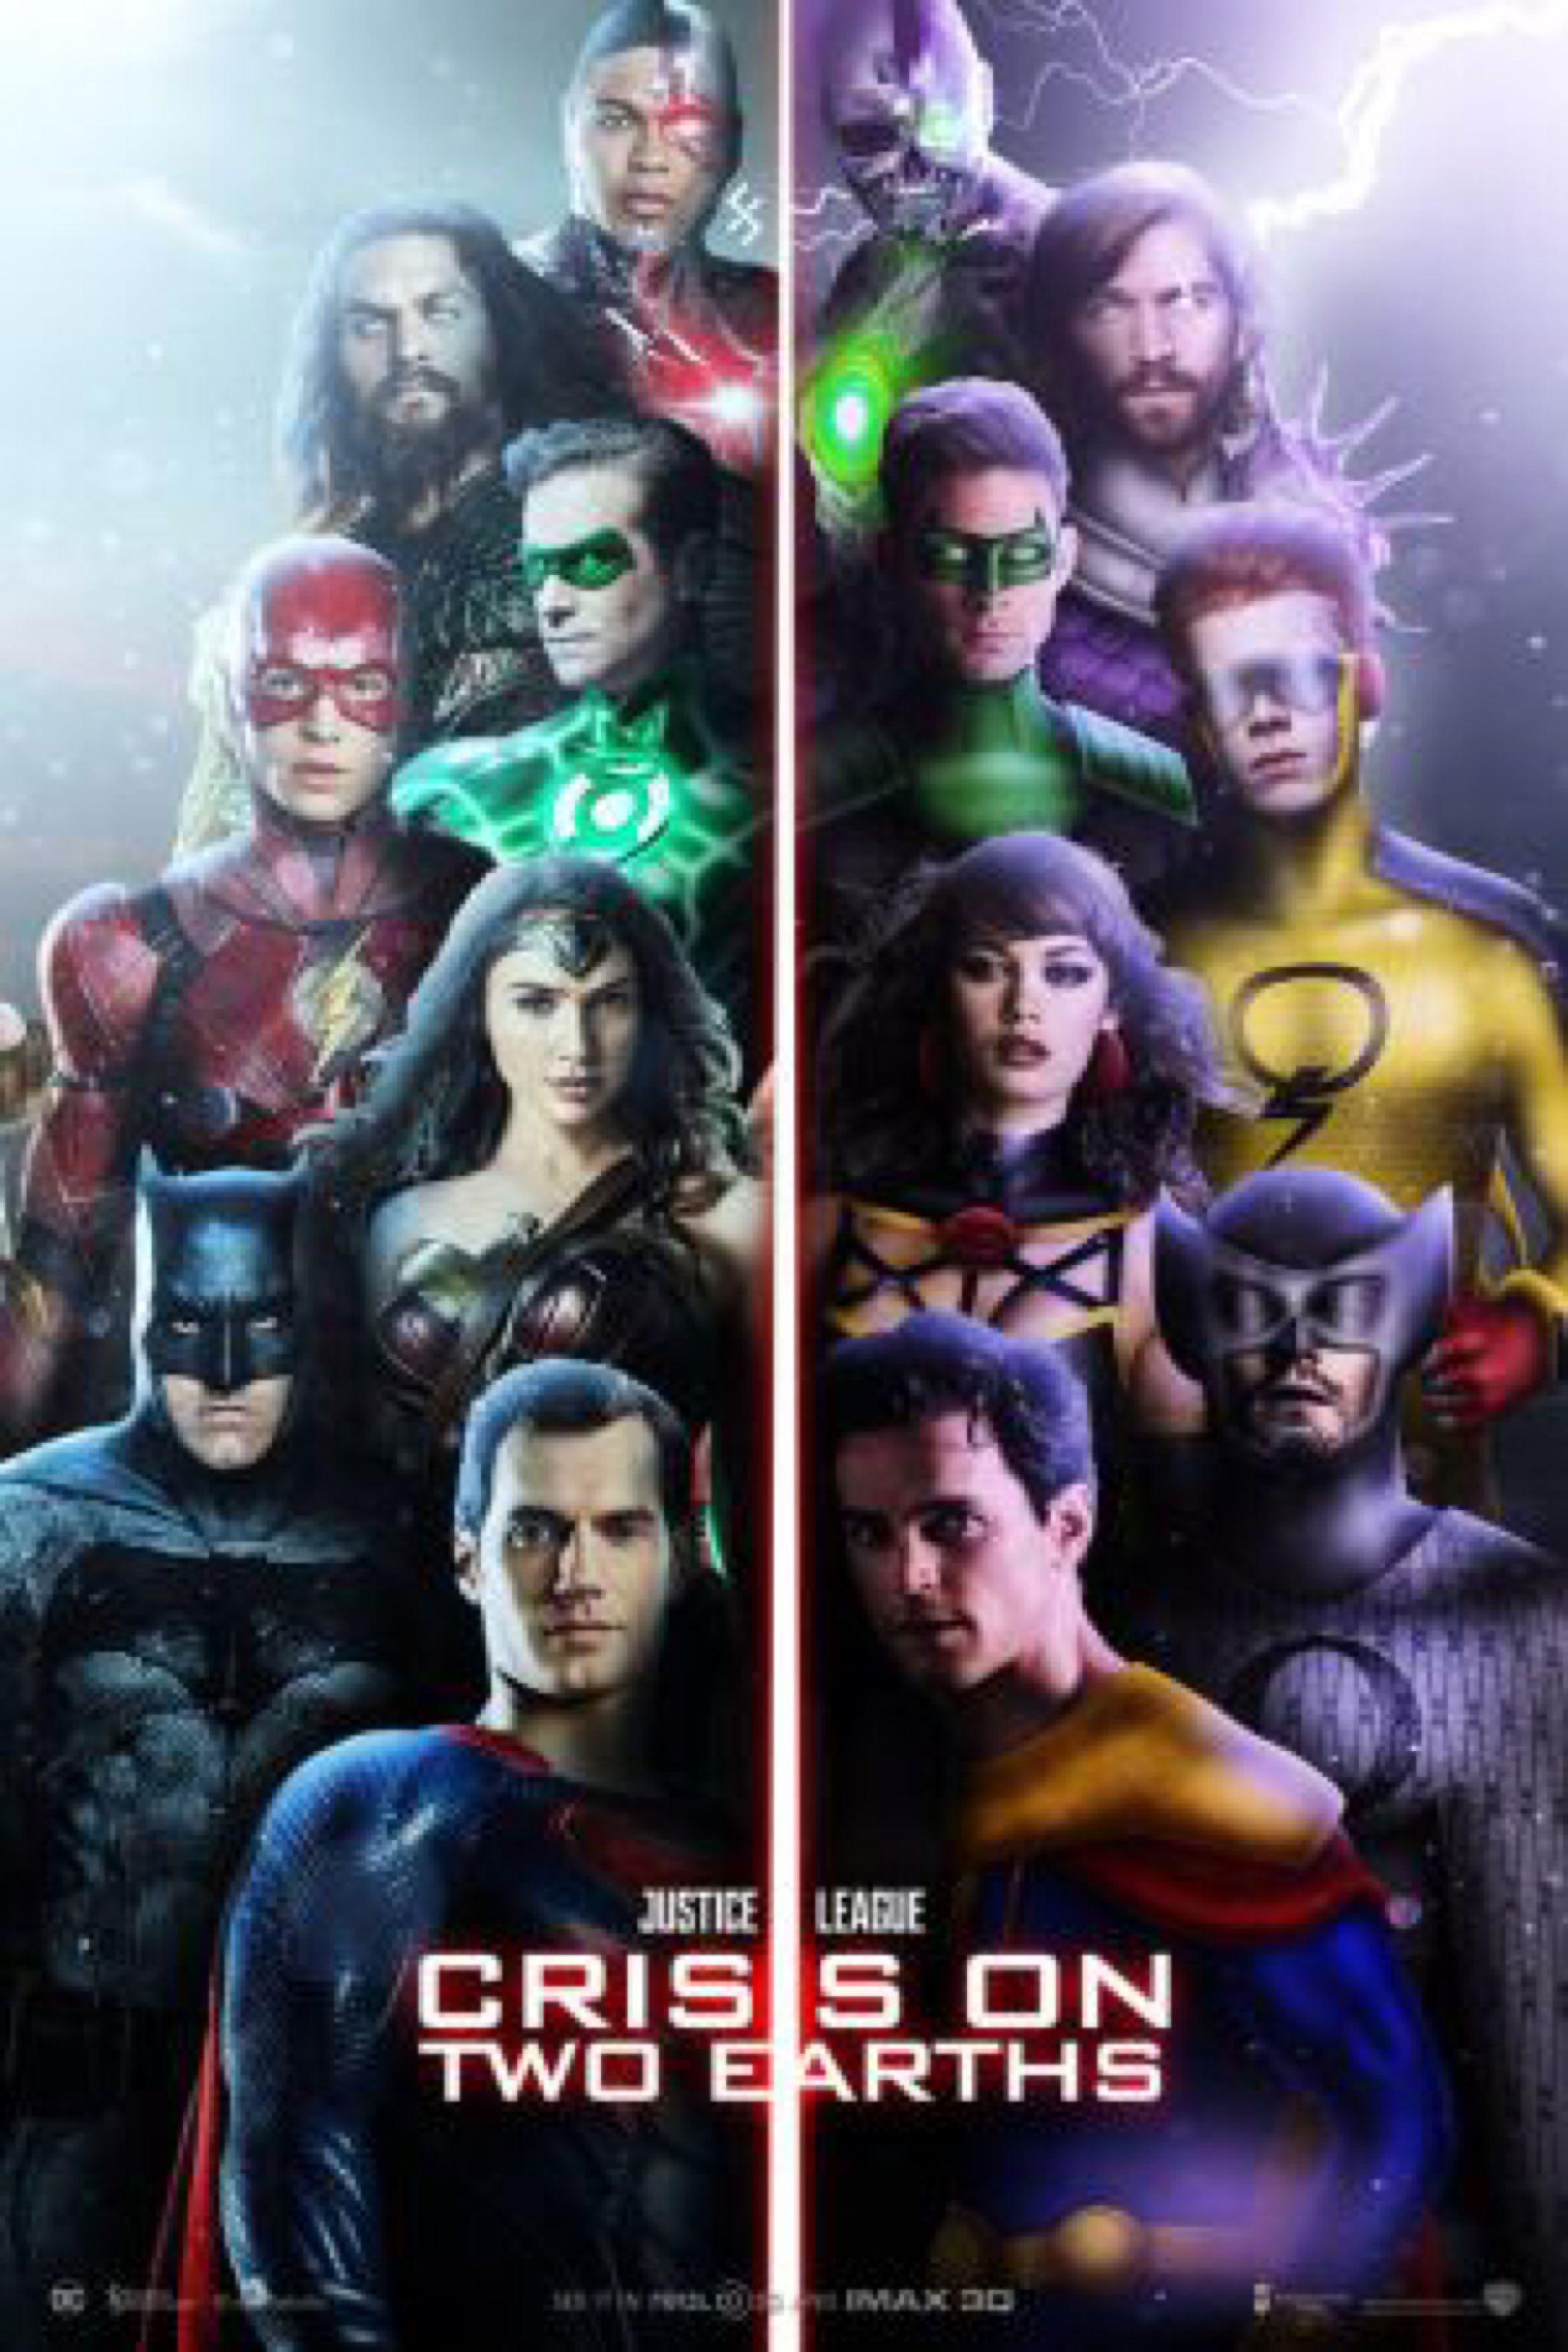 Justice League Crisis On Two Earths By Farrrou On Deviantart Dc Comics Artwork Dc Comics Art Superhero Art